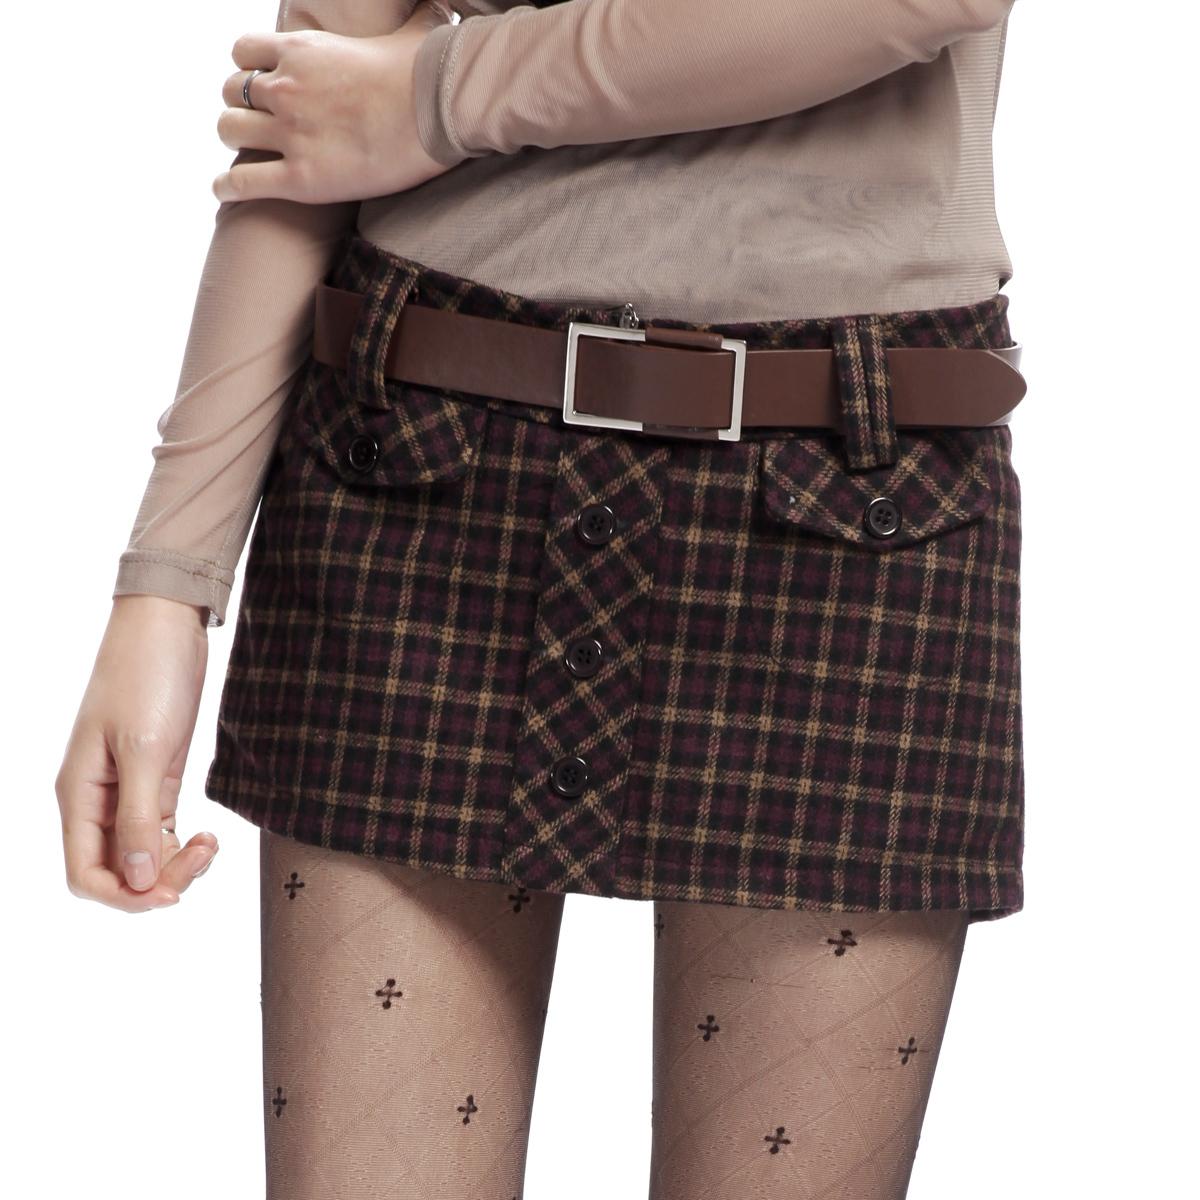 Женские брюки Water Motoko SYZ/06B SYZ Шорты, мини-шорты Другая форма брюк